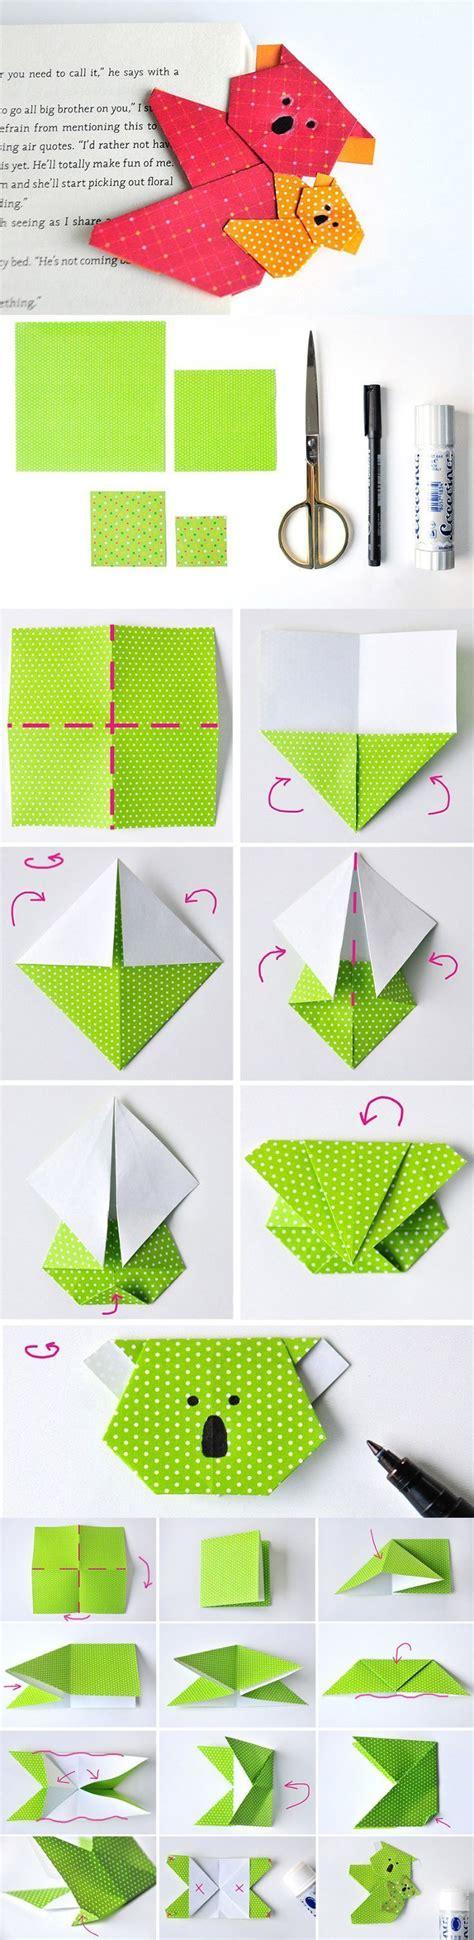 how to make an origami koala 25 best ideas about origami koala on